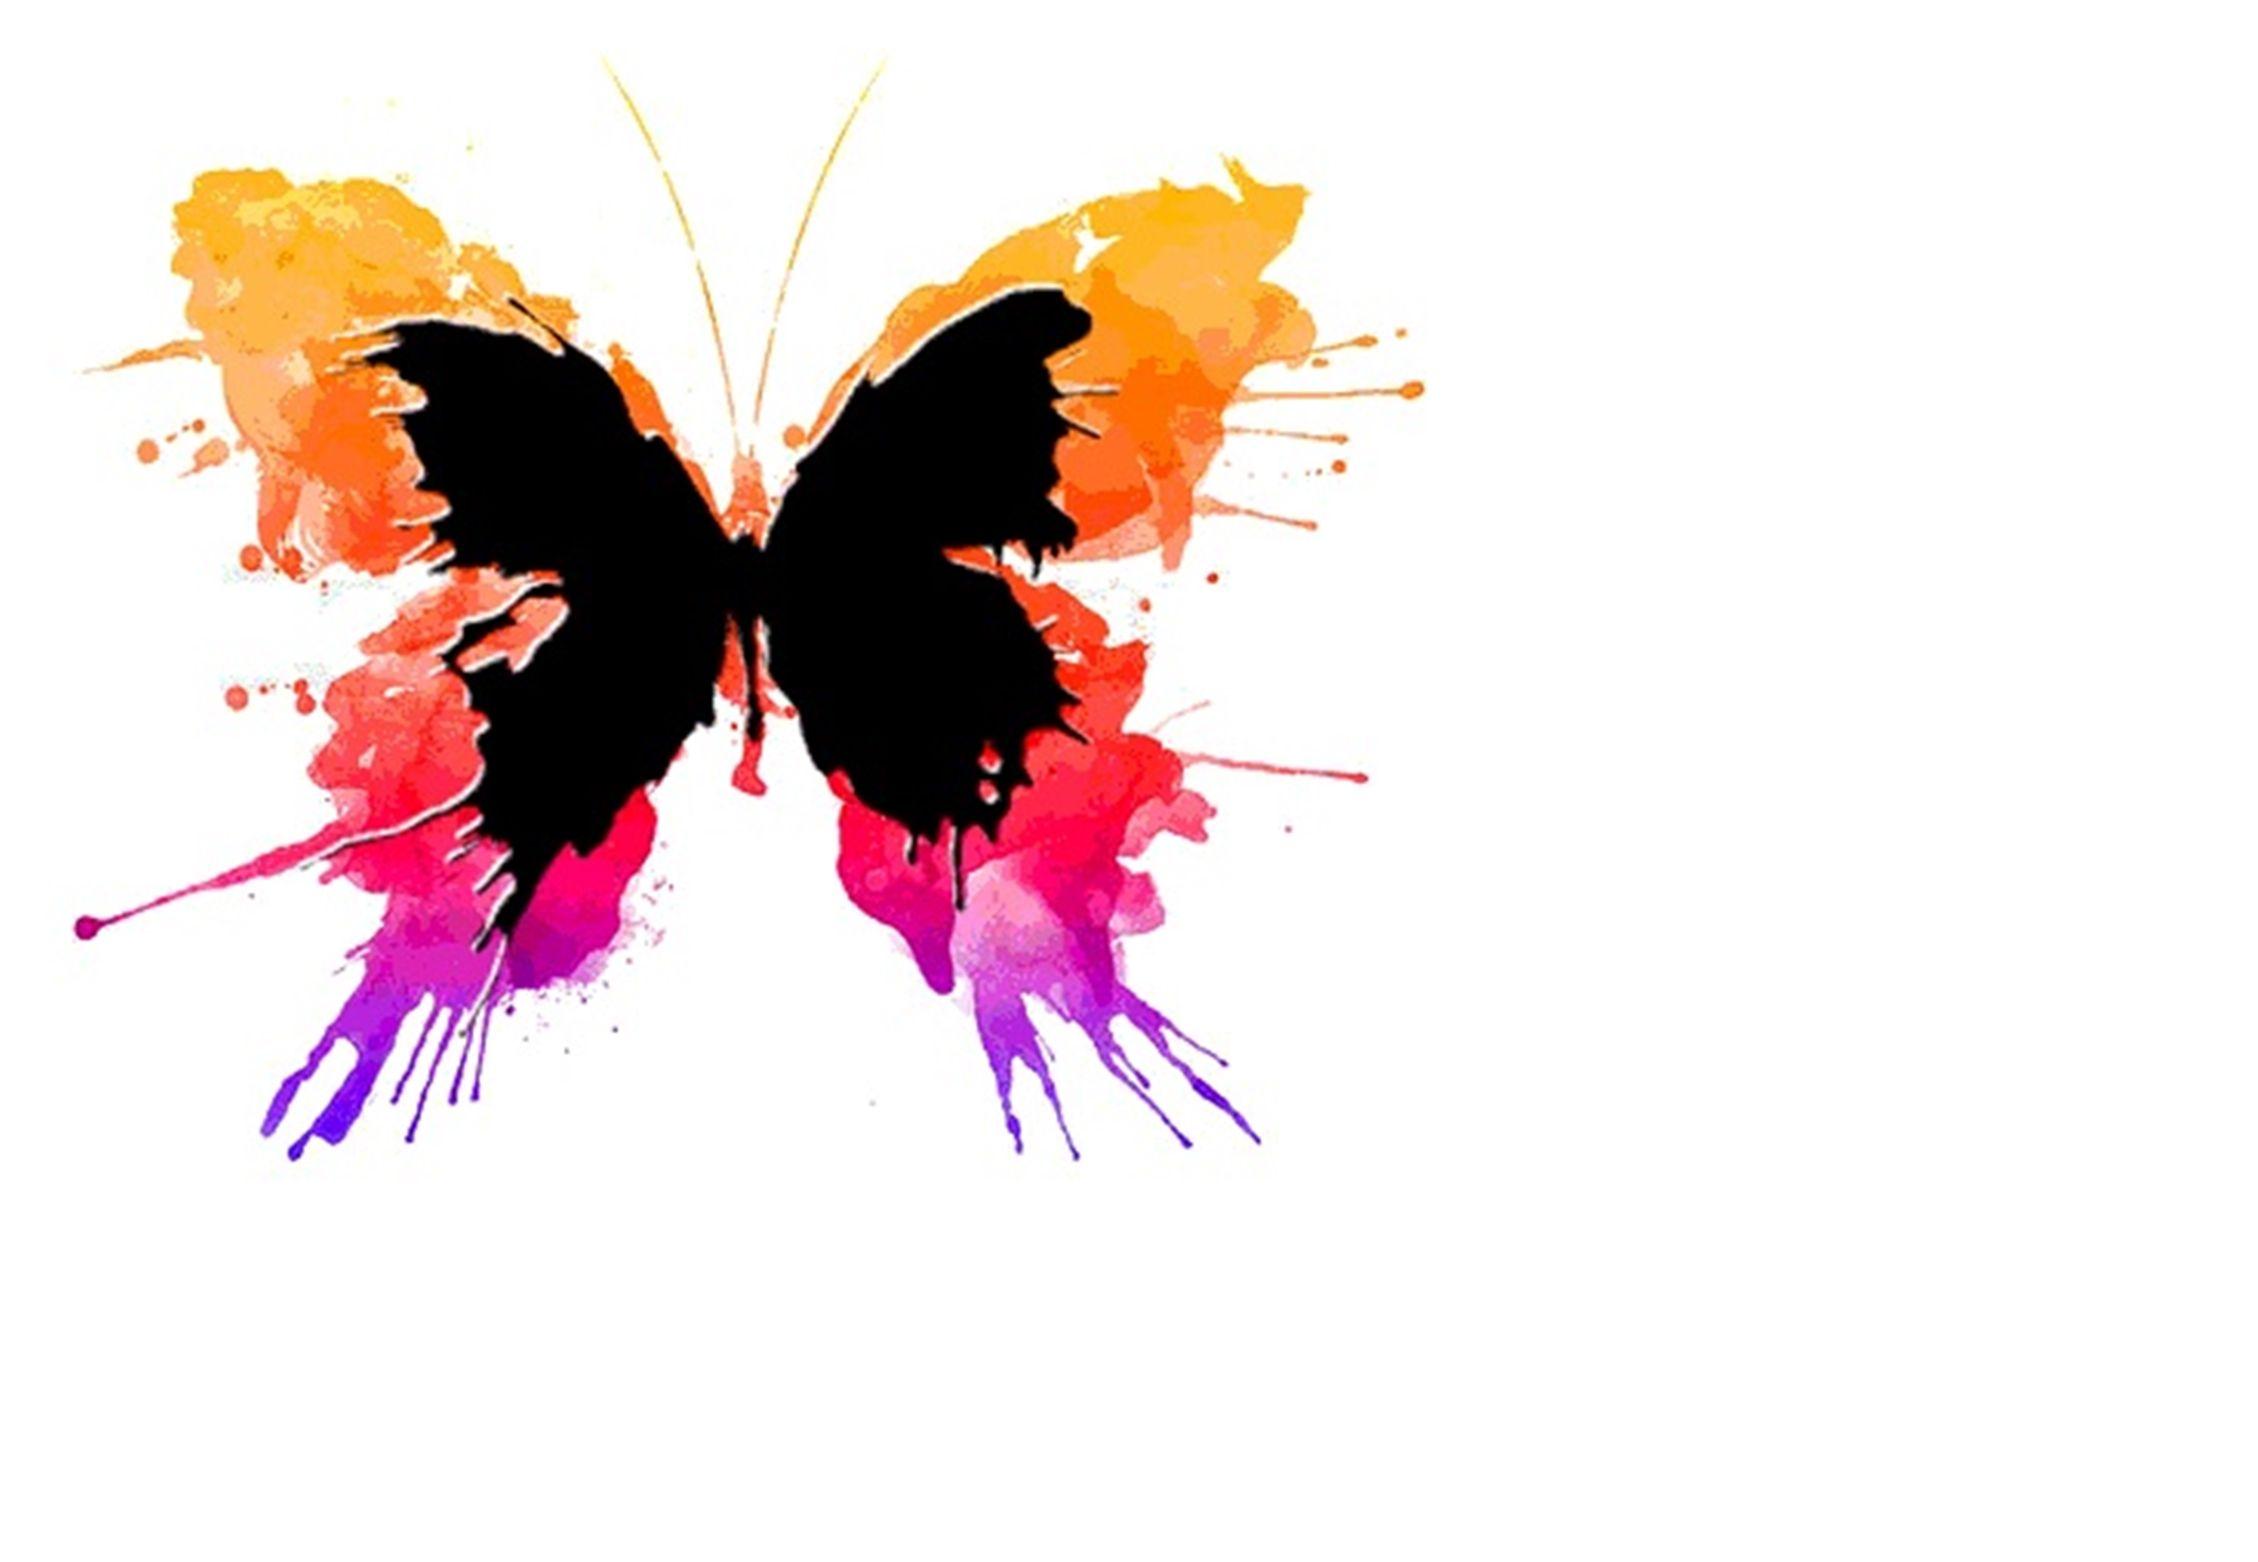 98bf62a04 Hopefully my next tattoo. Paint splatter watercolor. :-) | Tattoos ...